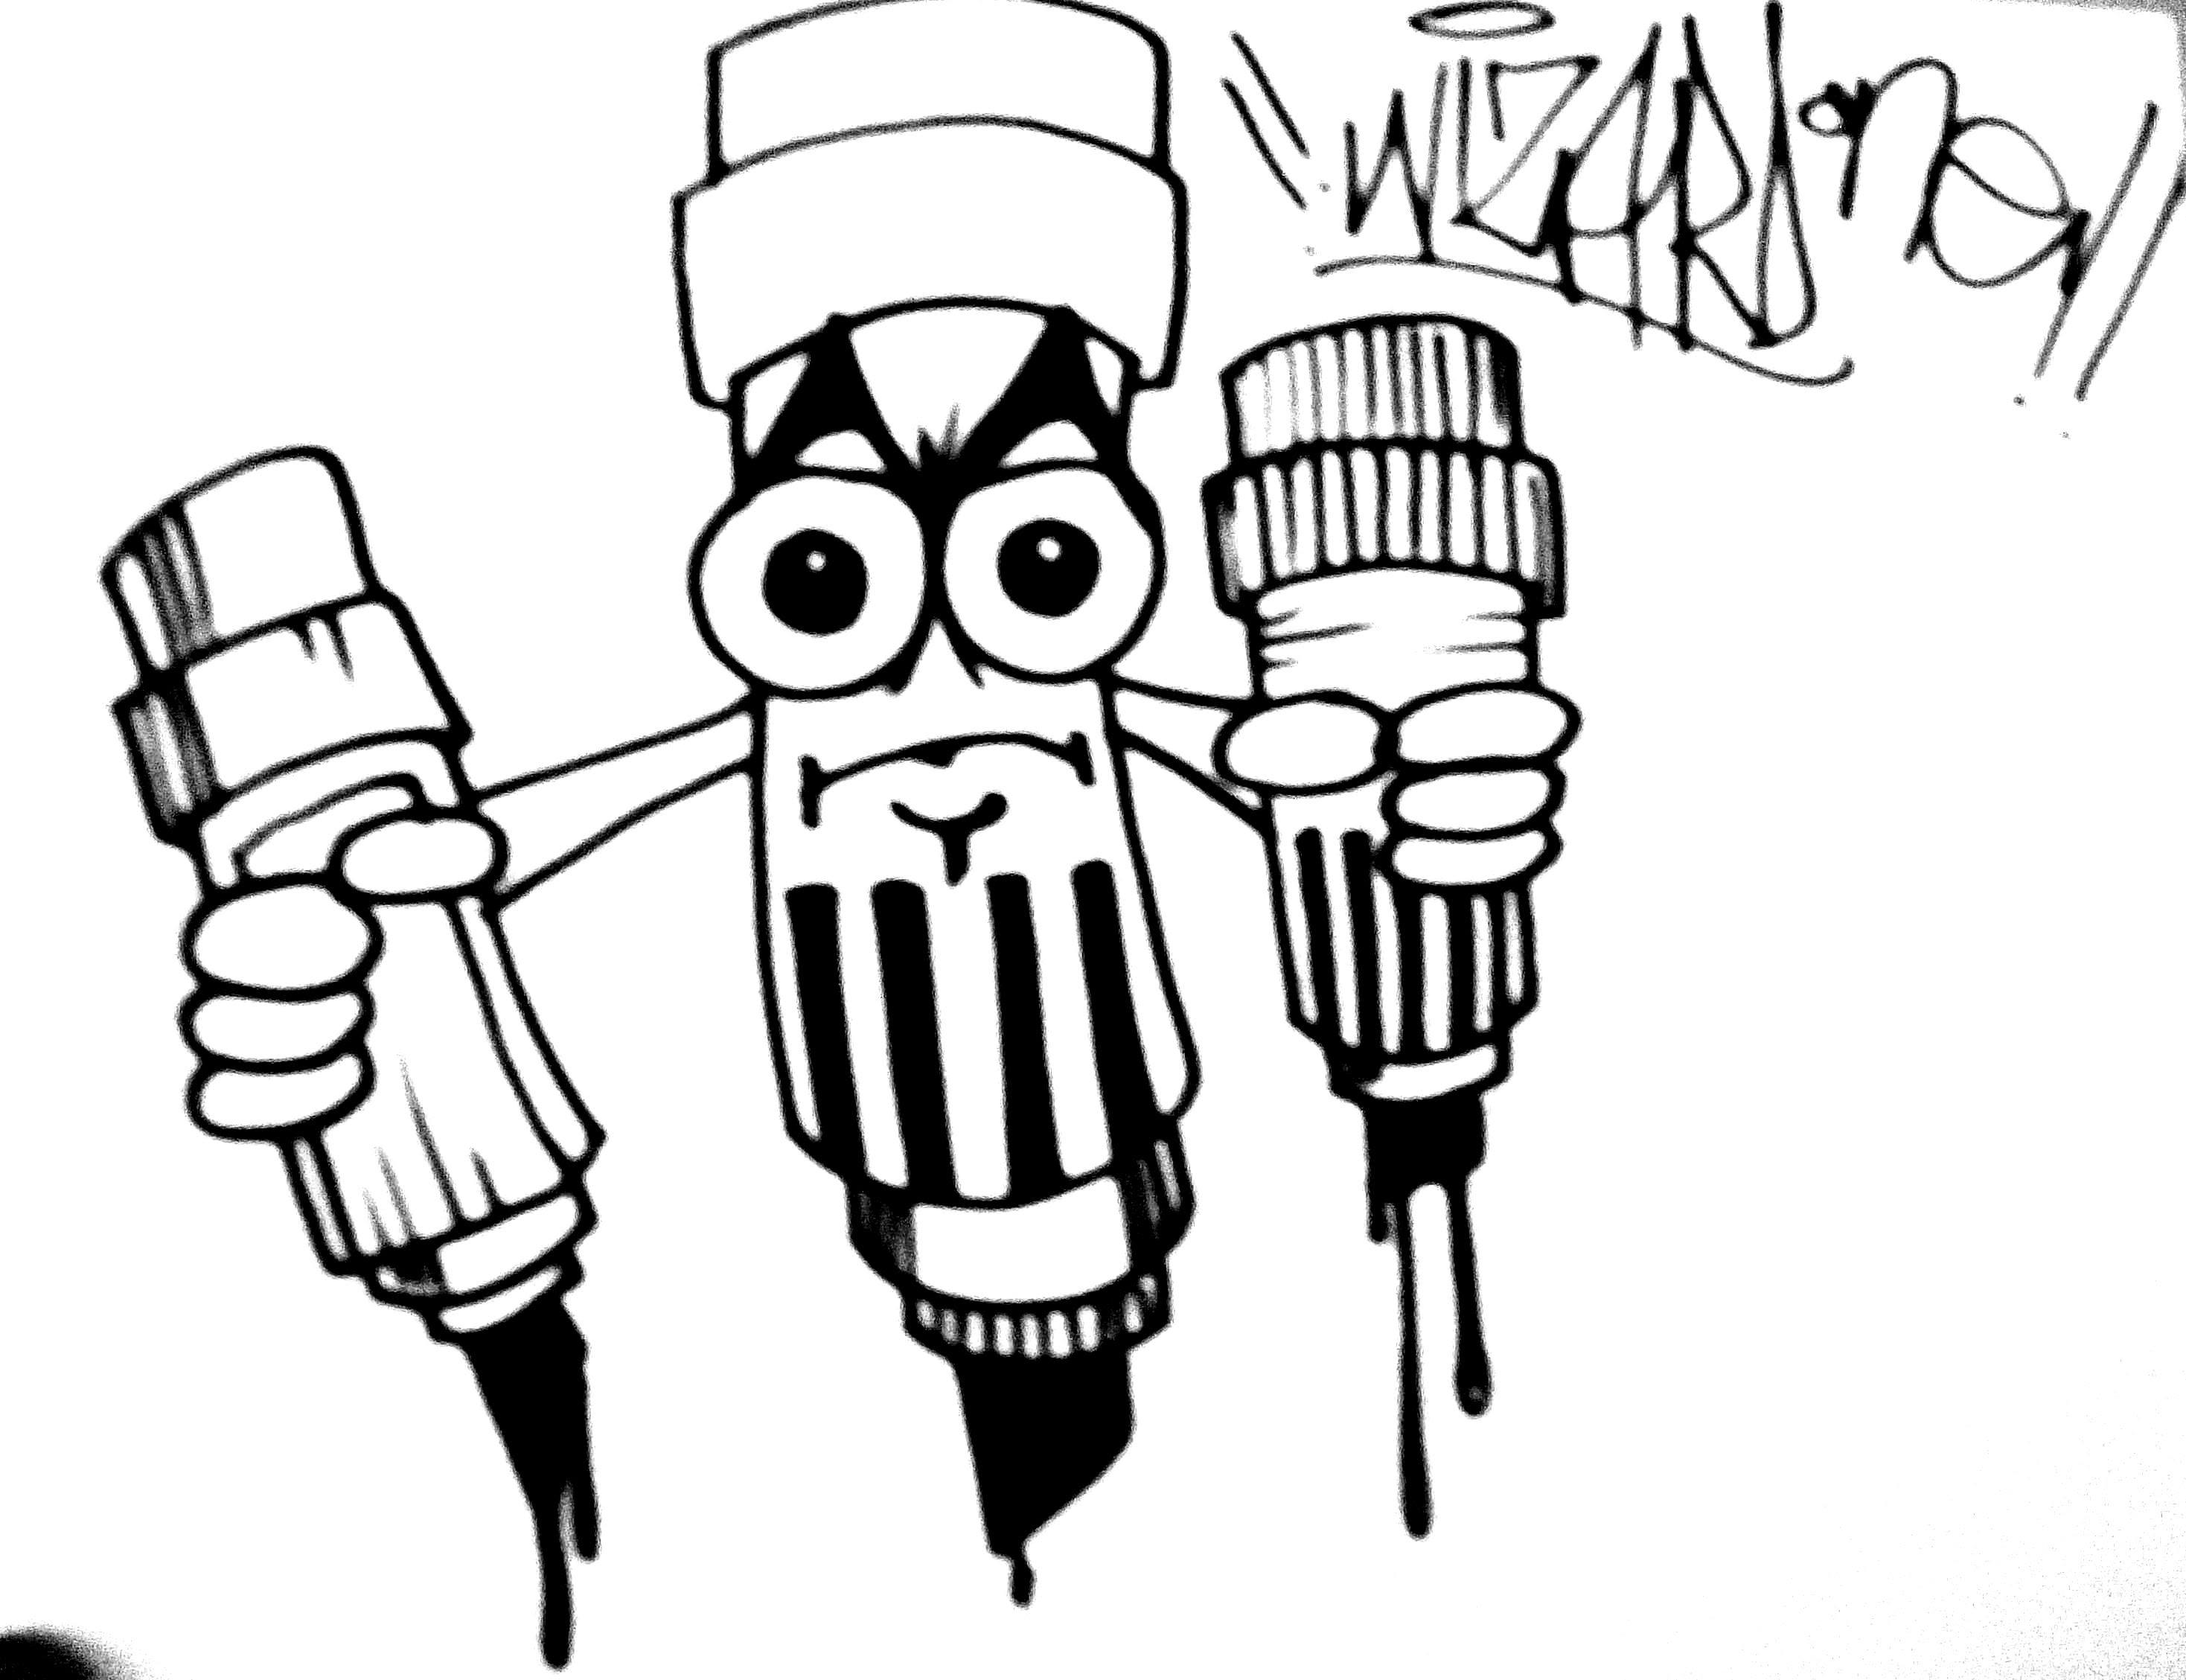 2937x2257 Drawings Of Family In Graffiti Drawing A Graffiti Marker Character